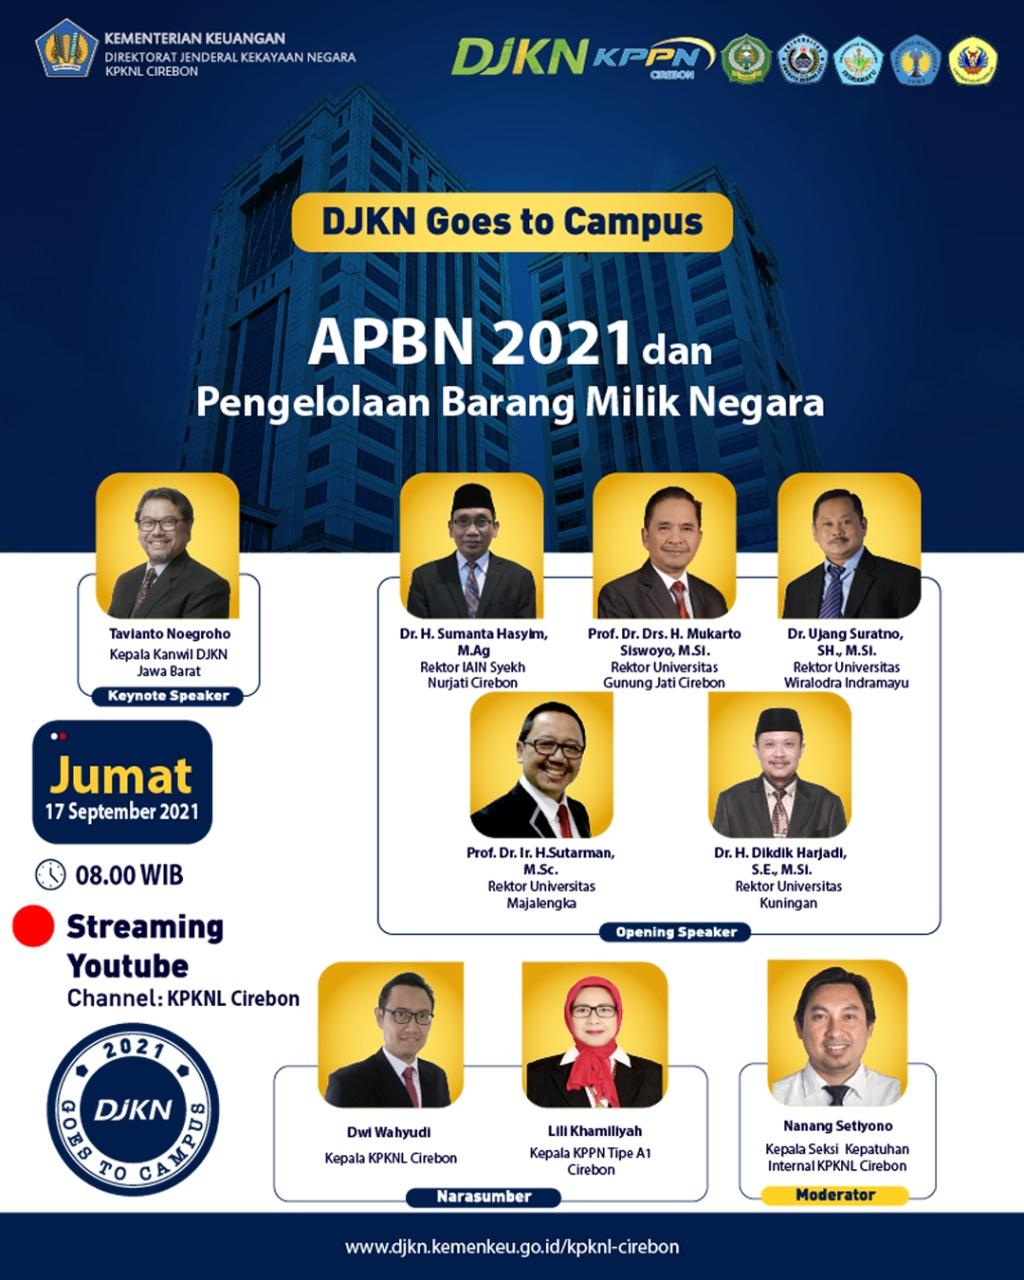 KPKNL-KPPN Cirebon Berikan Edukasi APBN 2021 dan Pengelolaan BMN pada Mahasiswa Perguruan Tinggi di Ciayumajakuning